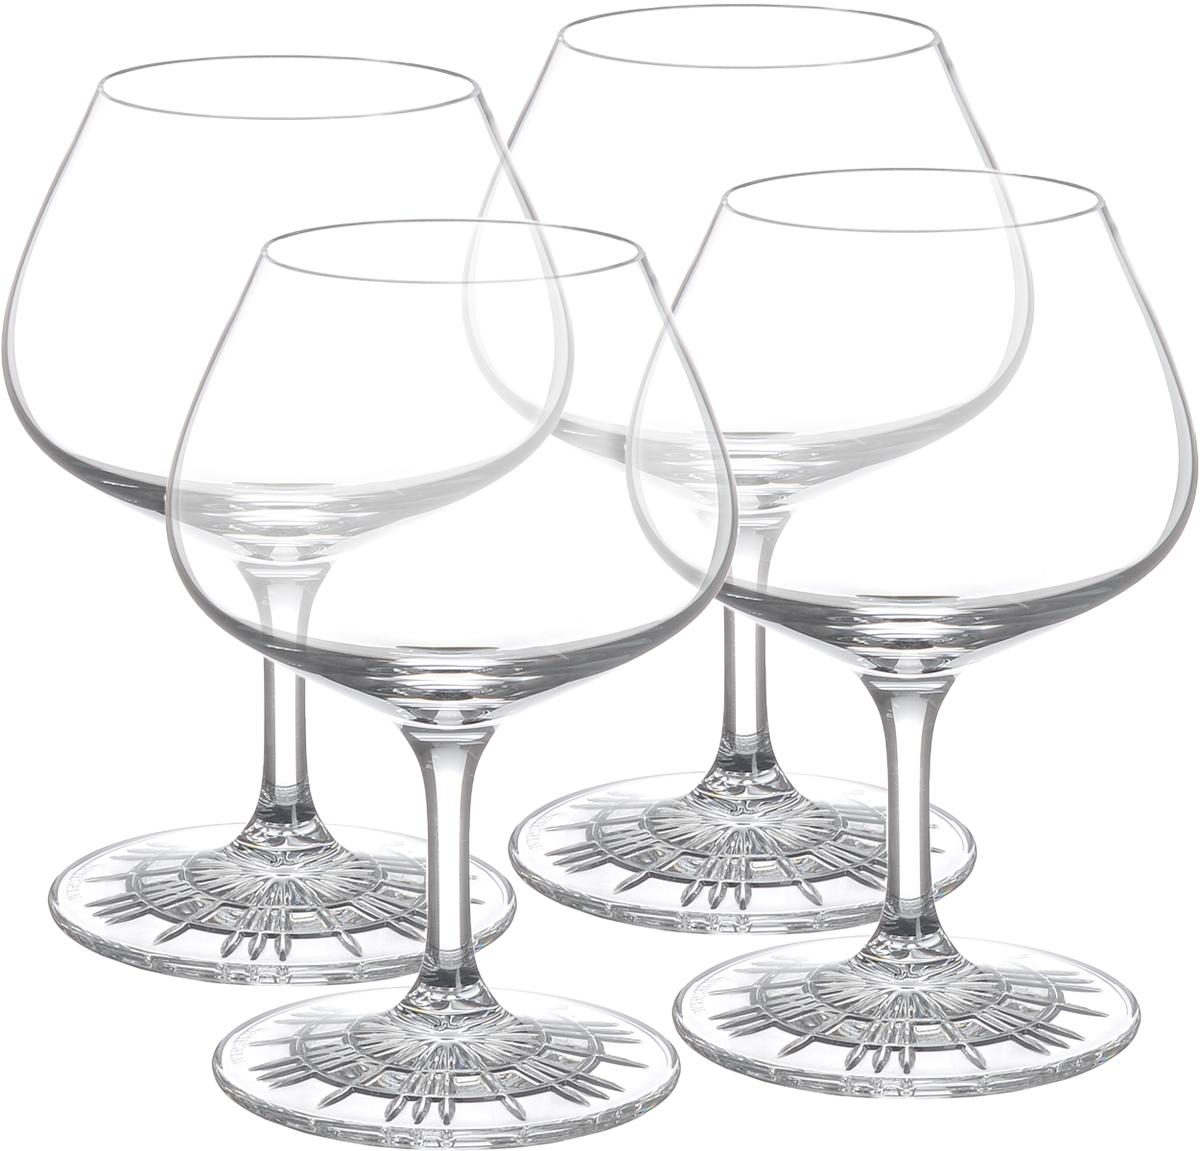 Набор бокалов для коньяка Spiegelau Perfect Cocktail Glass, 205 мл, 4 шт набор бокалов бокалов spiegelau authentis 12 предметов